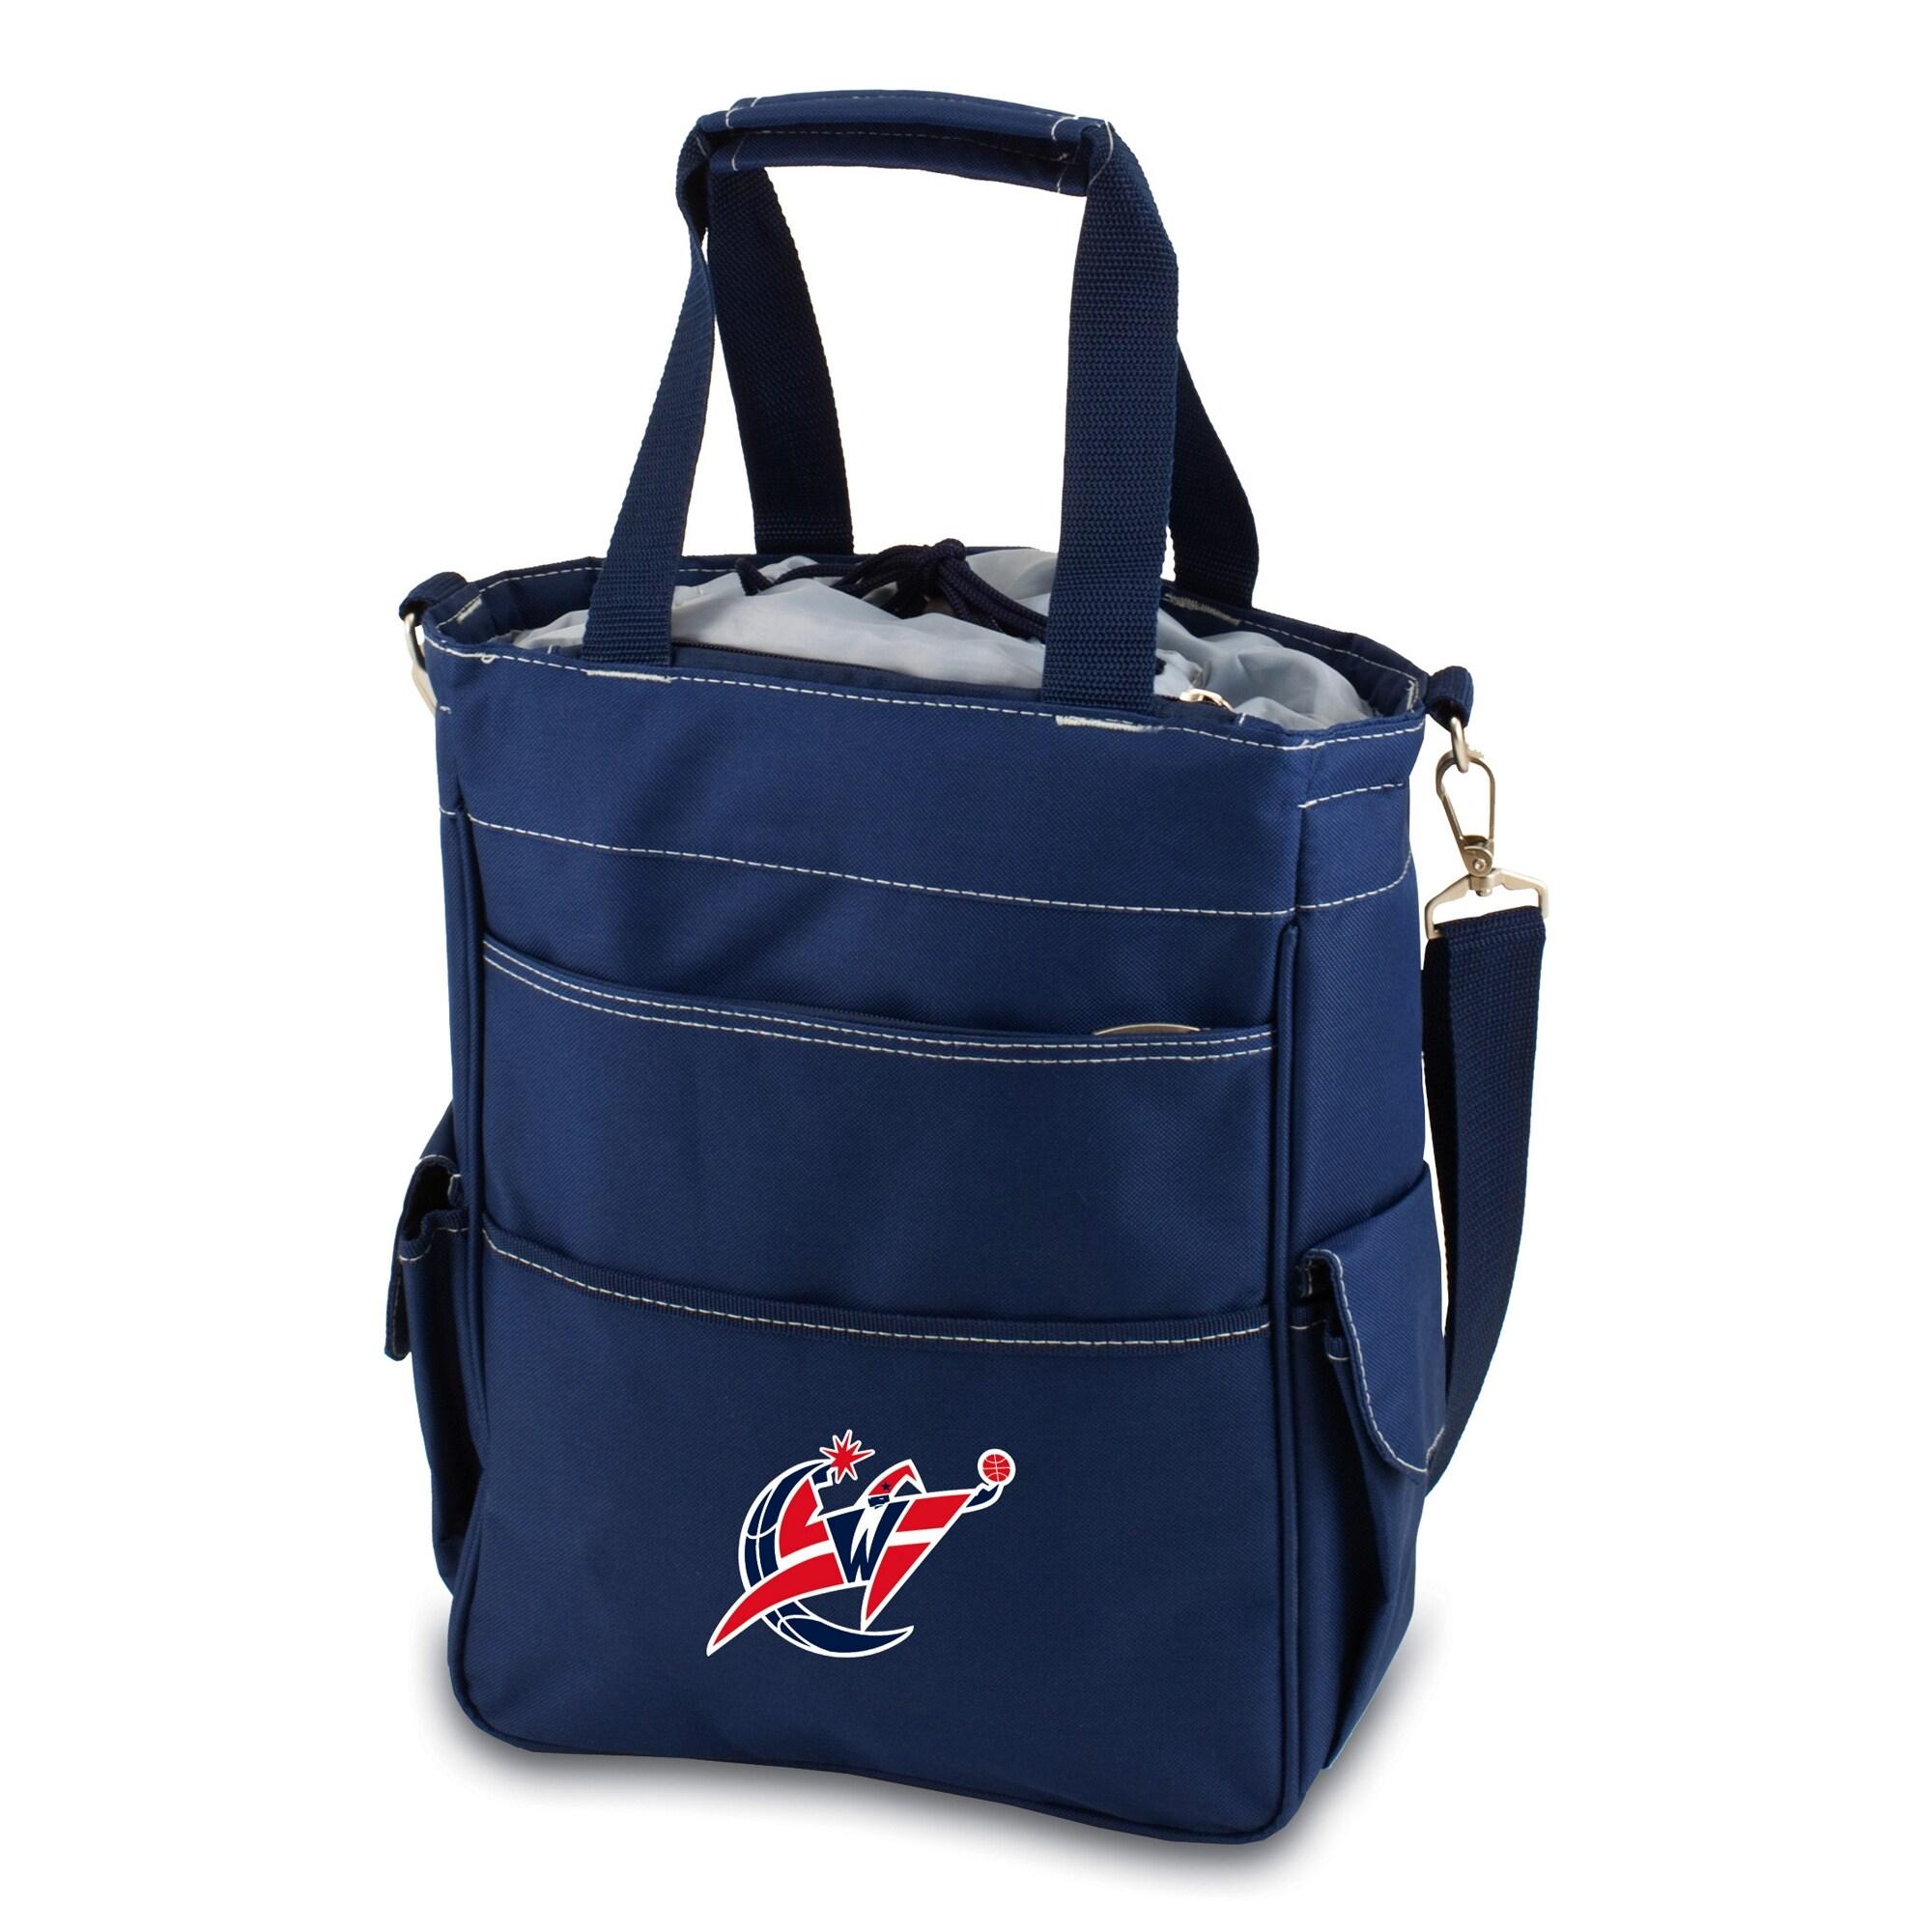 Washington Wizards Activo Waterproof Tote Bag - Navy Blue